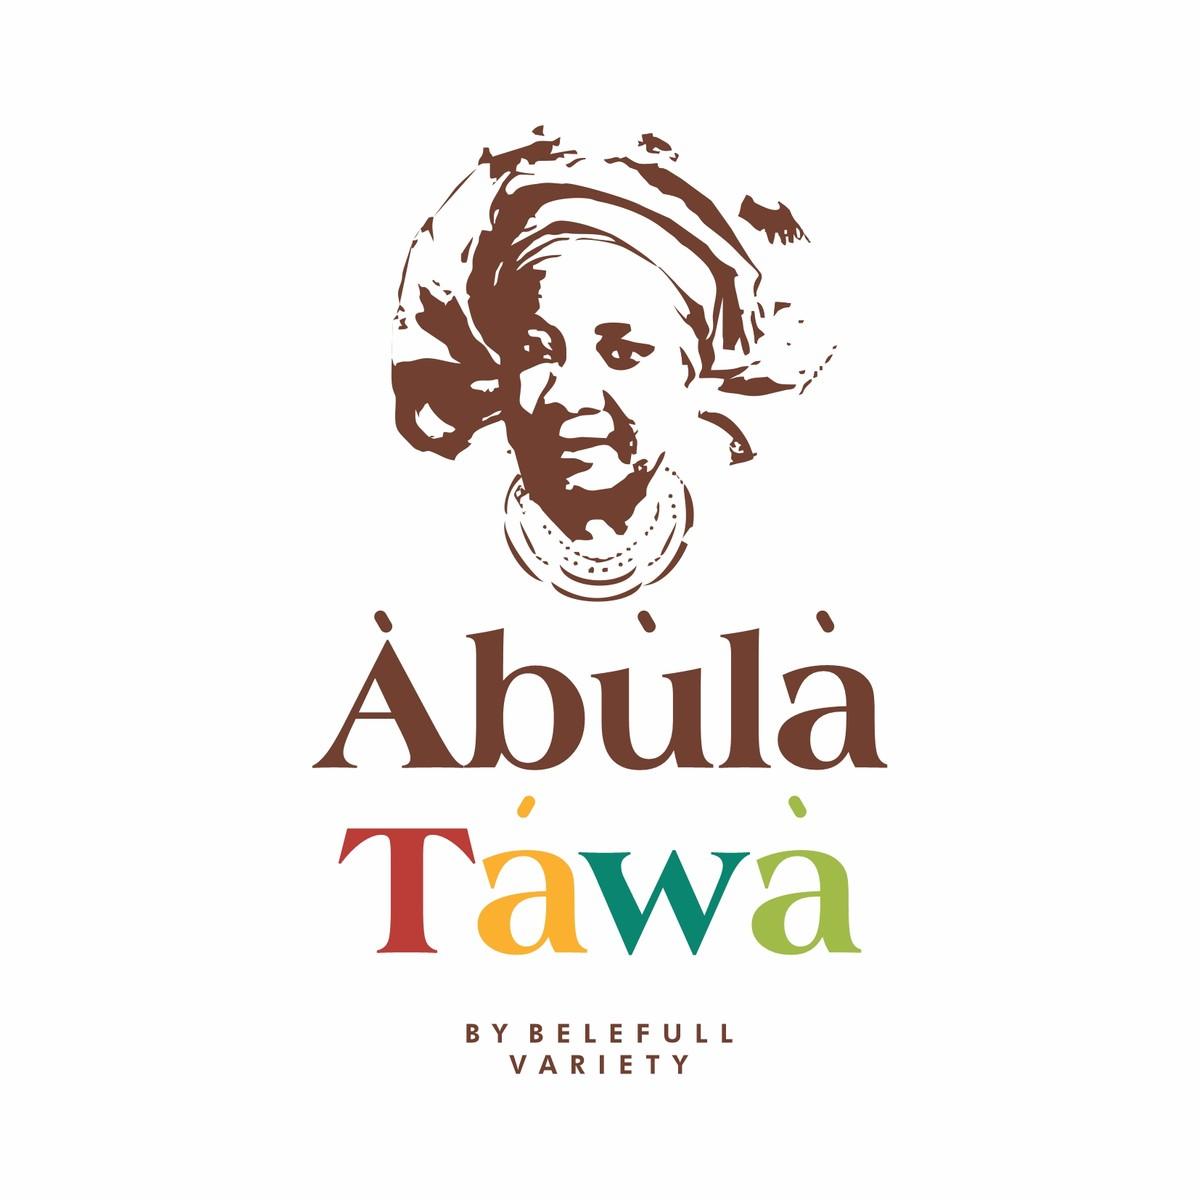 Abula Tawa Logo Design